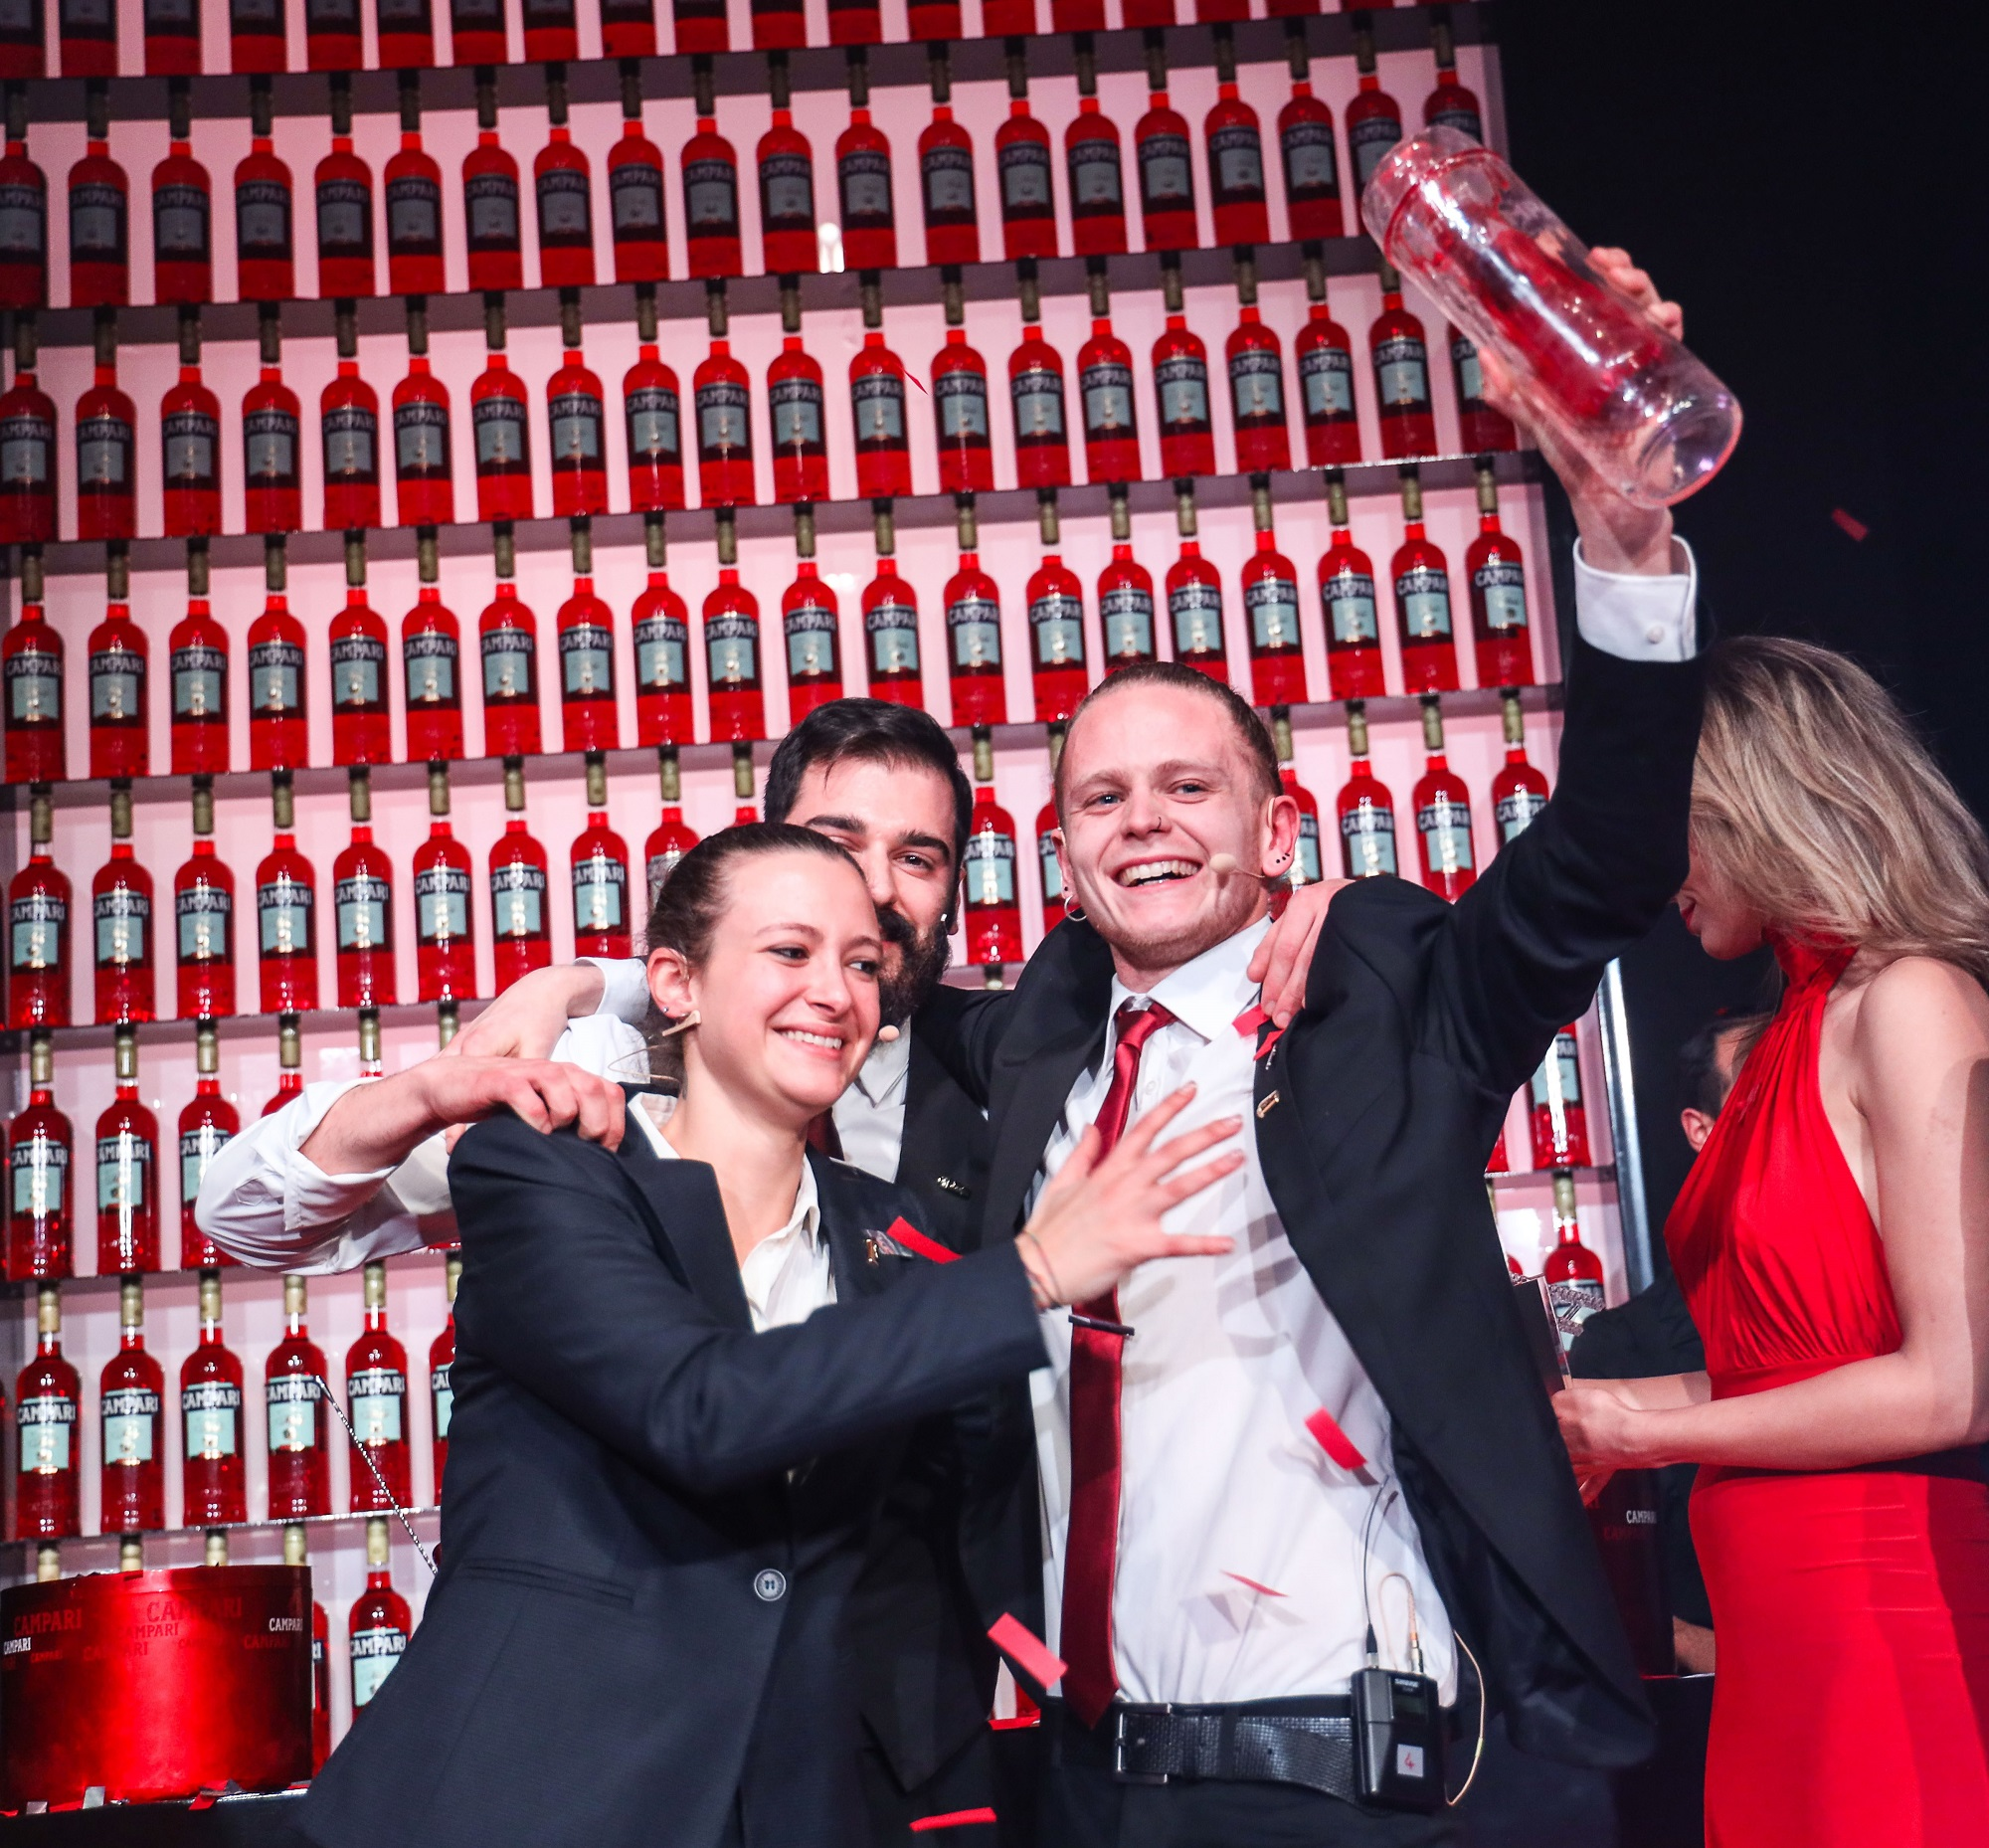 Campari Bar Competition